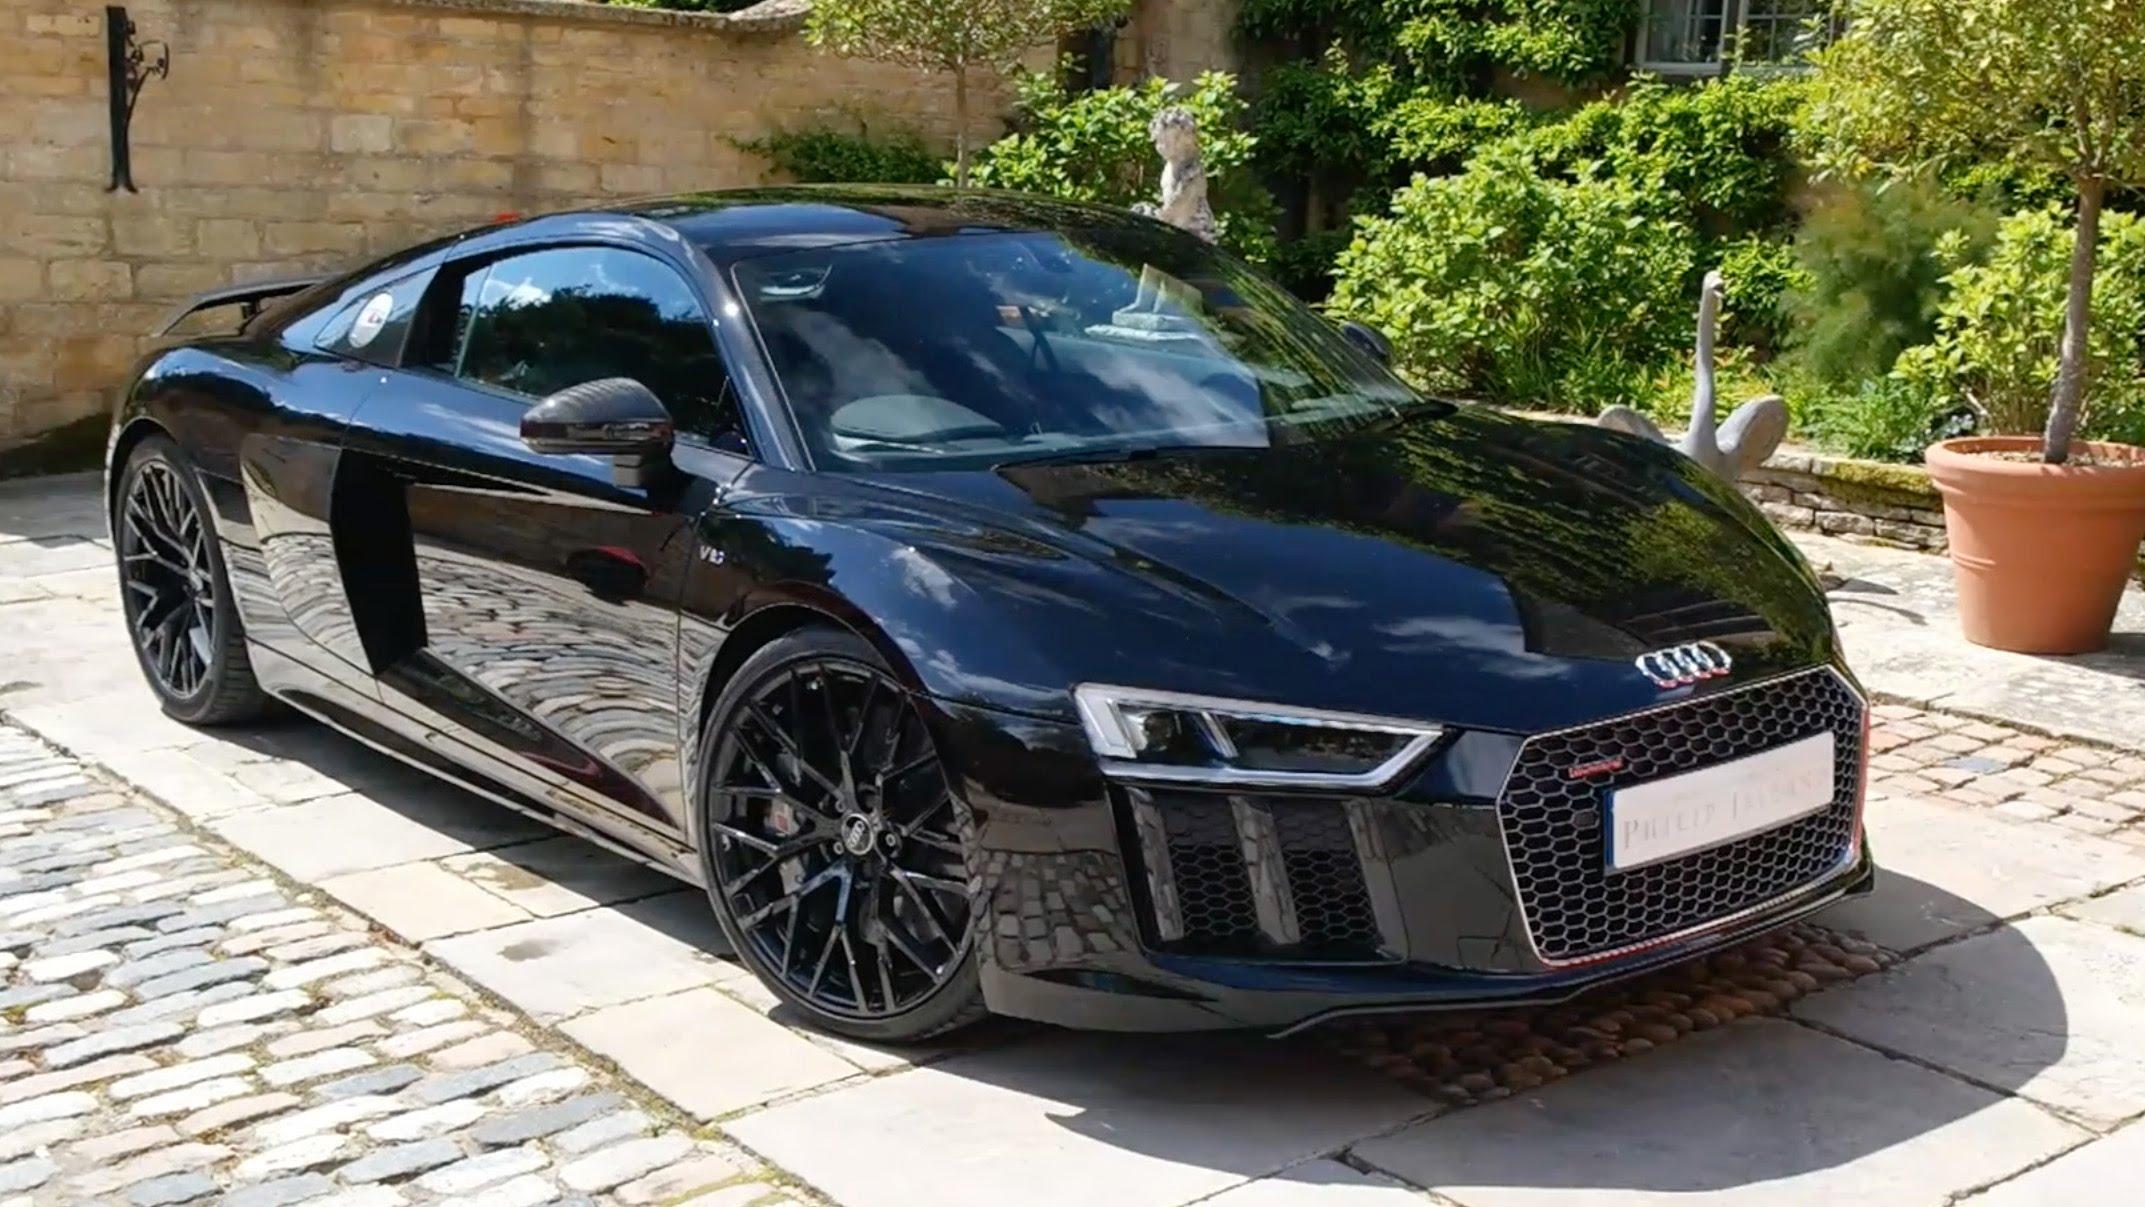 Audi R8 Car Hire Audi R8 Hire